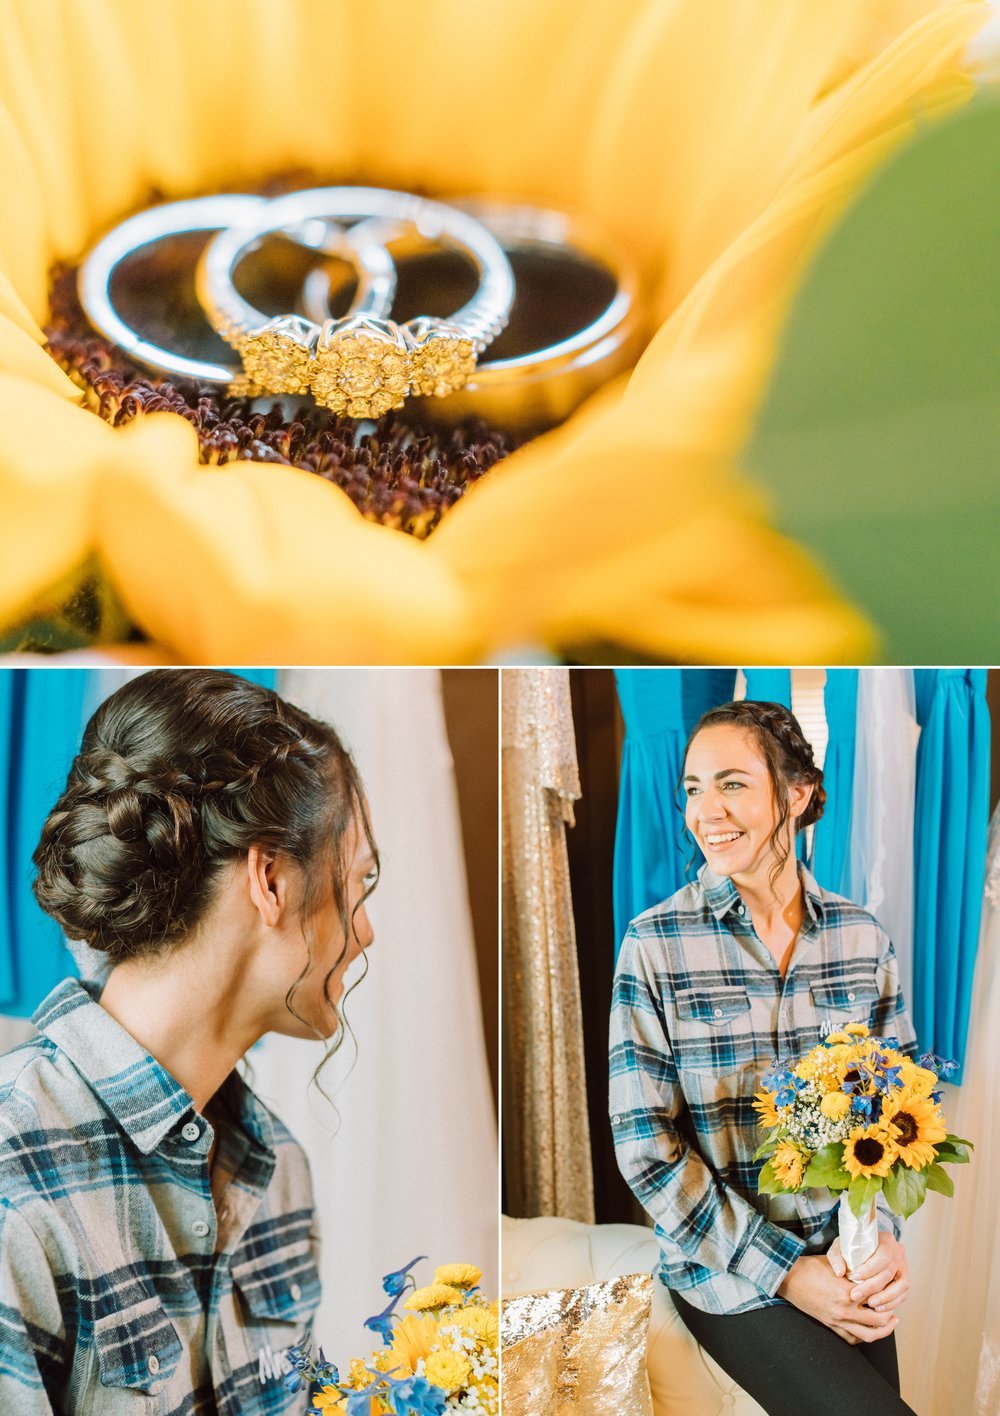 Rustic Sunflower & Blueberry Barn Wedding- Ever After Farms - Allie & NickBlog 1.jpg